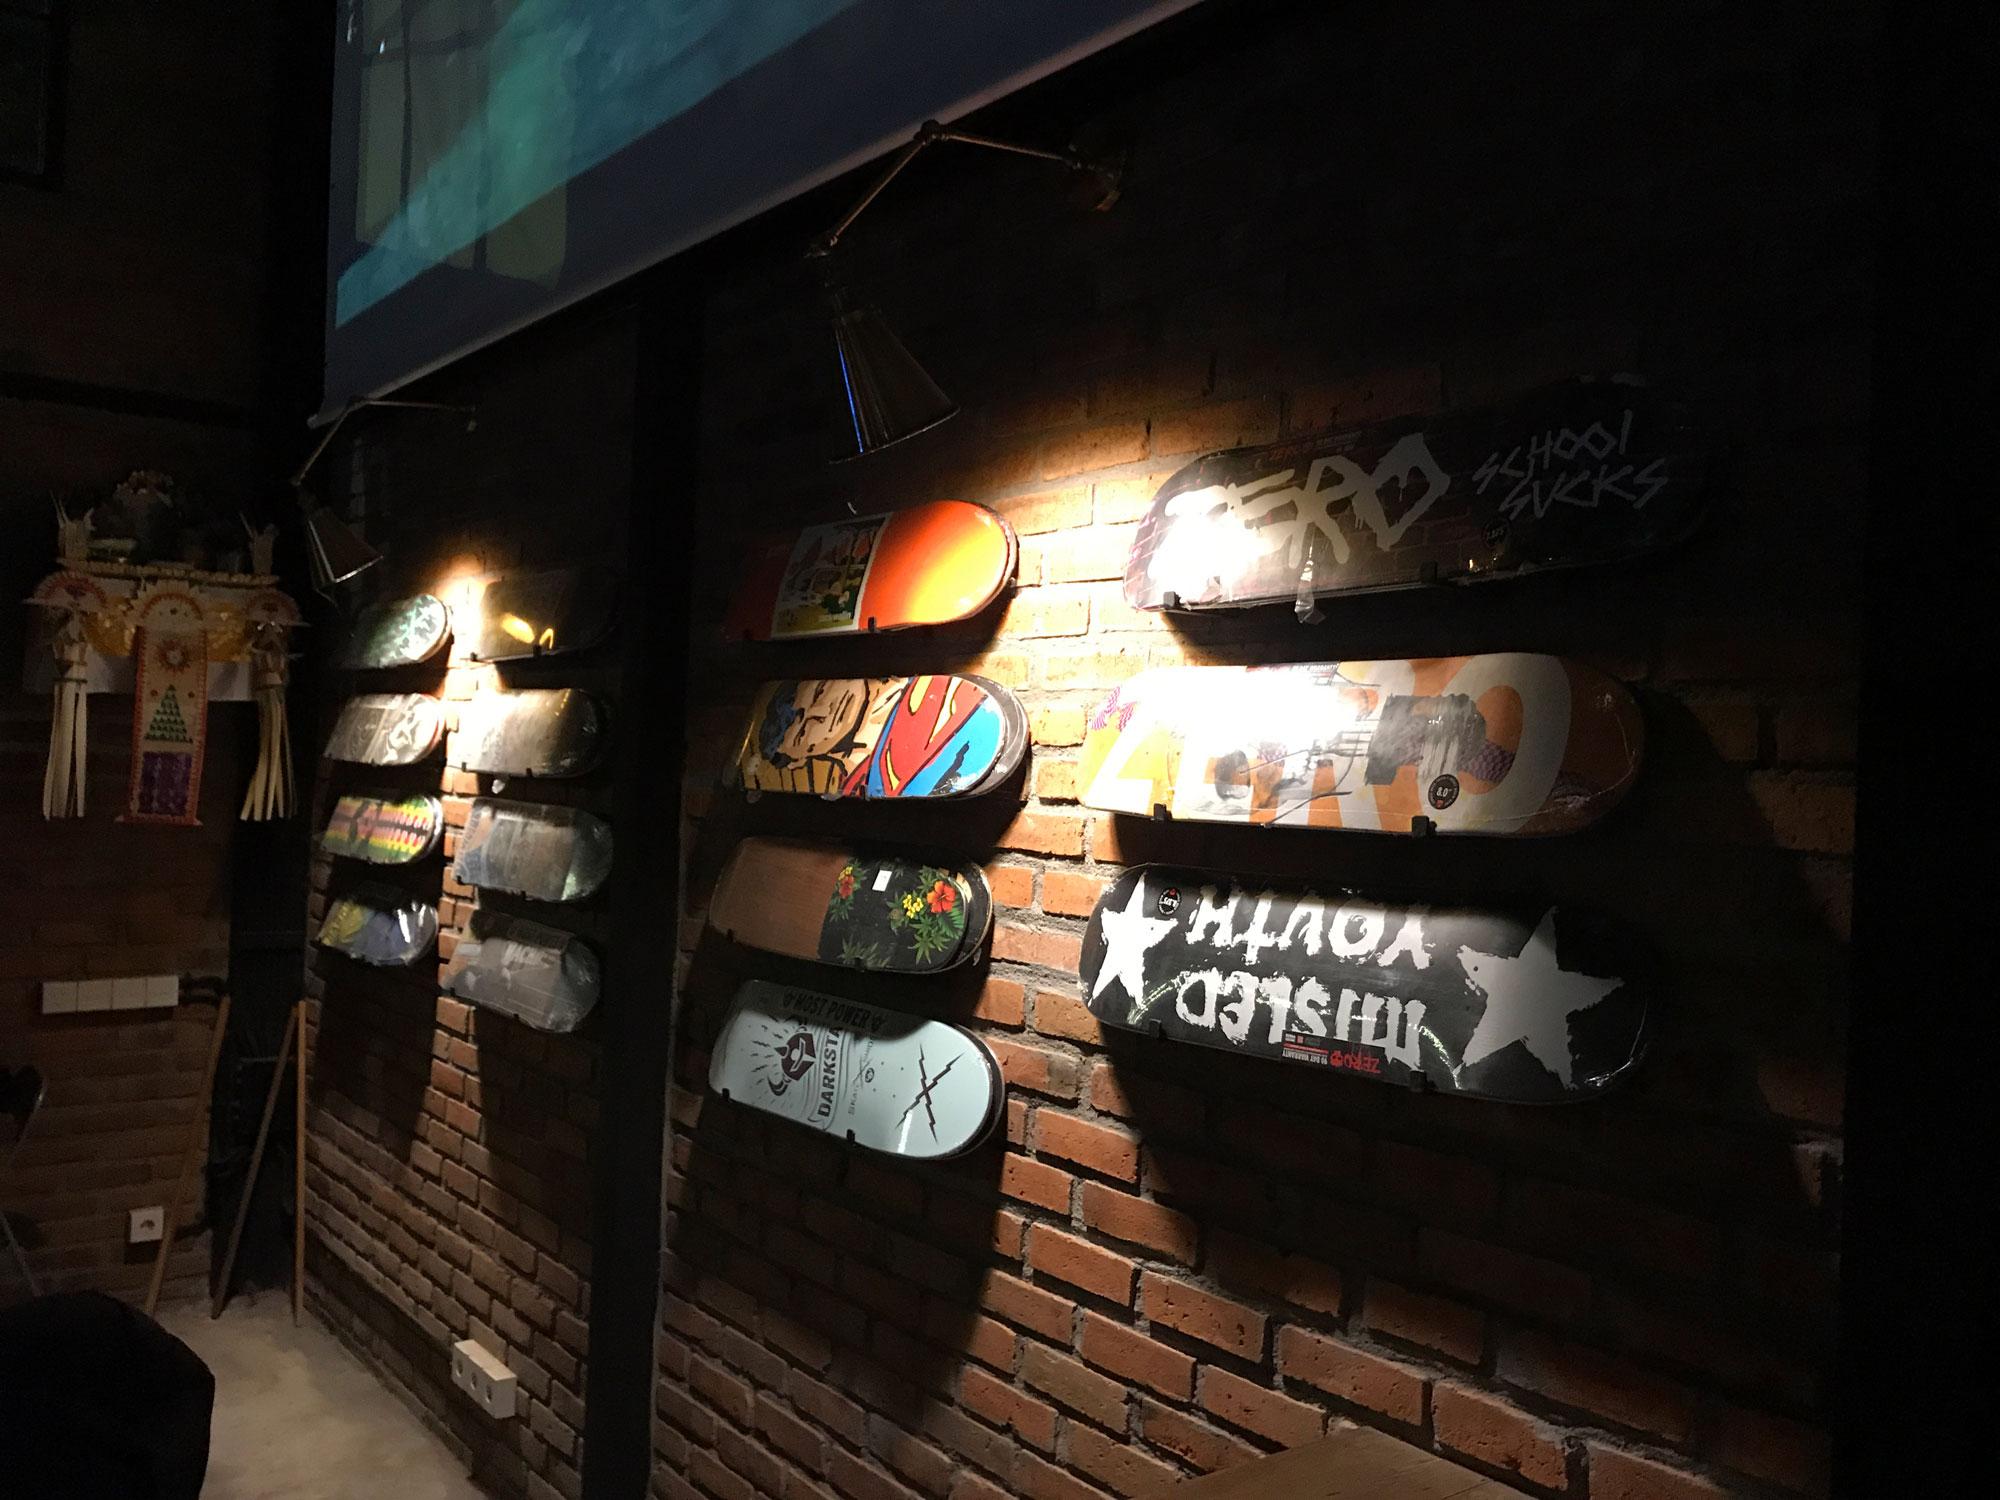 Konkrete skate shop - Canggu, Bali